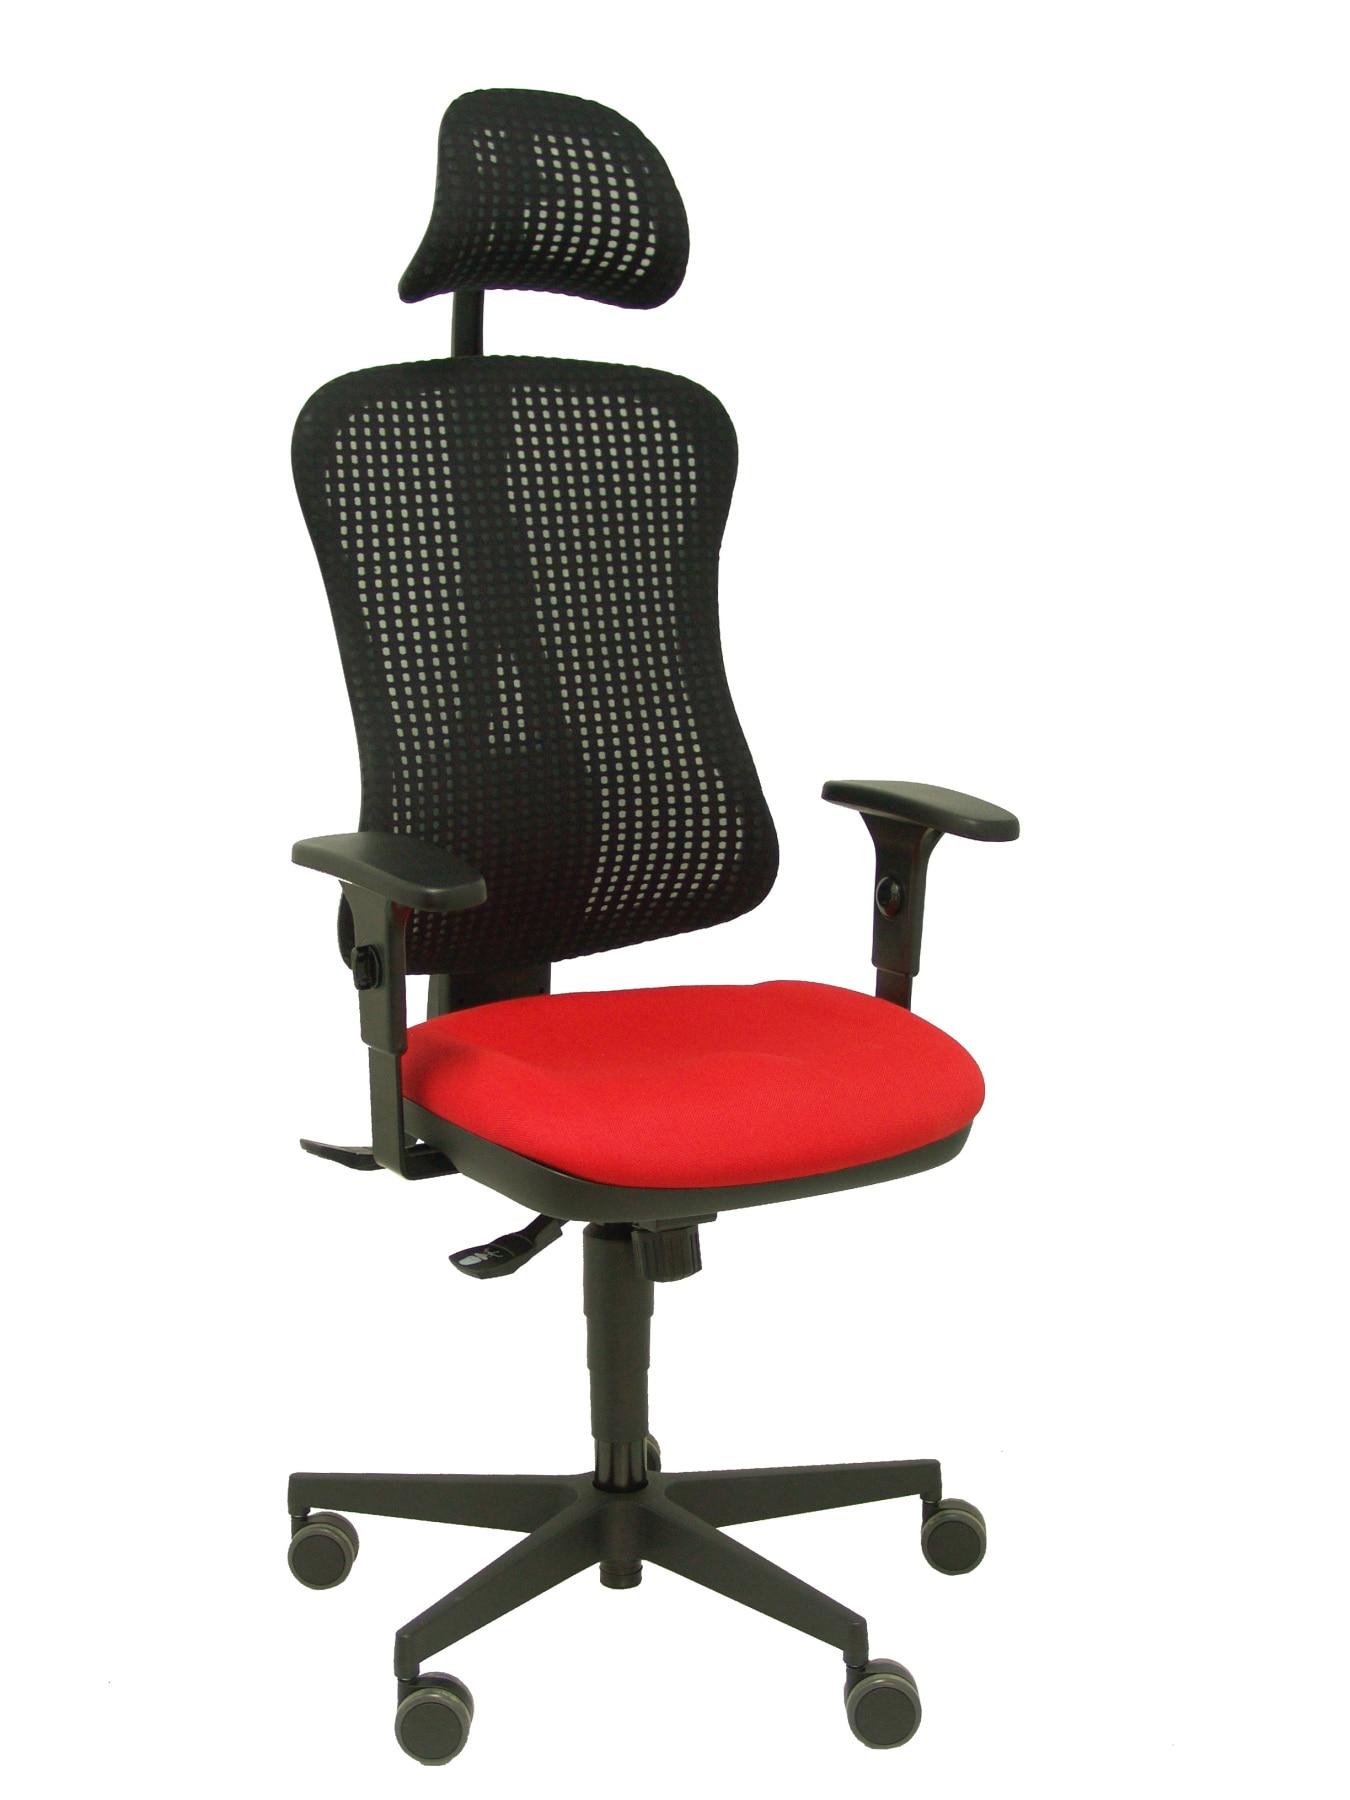 Office chair ergonomics headboard mechanism synchro  arms adjustable breathable mesh Backrest color|  - title=